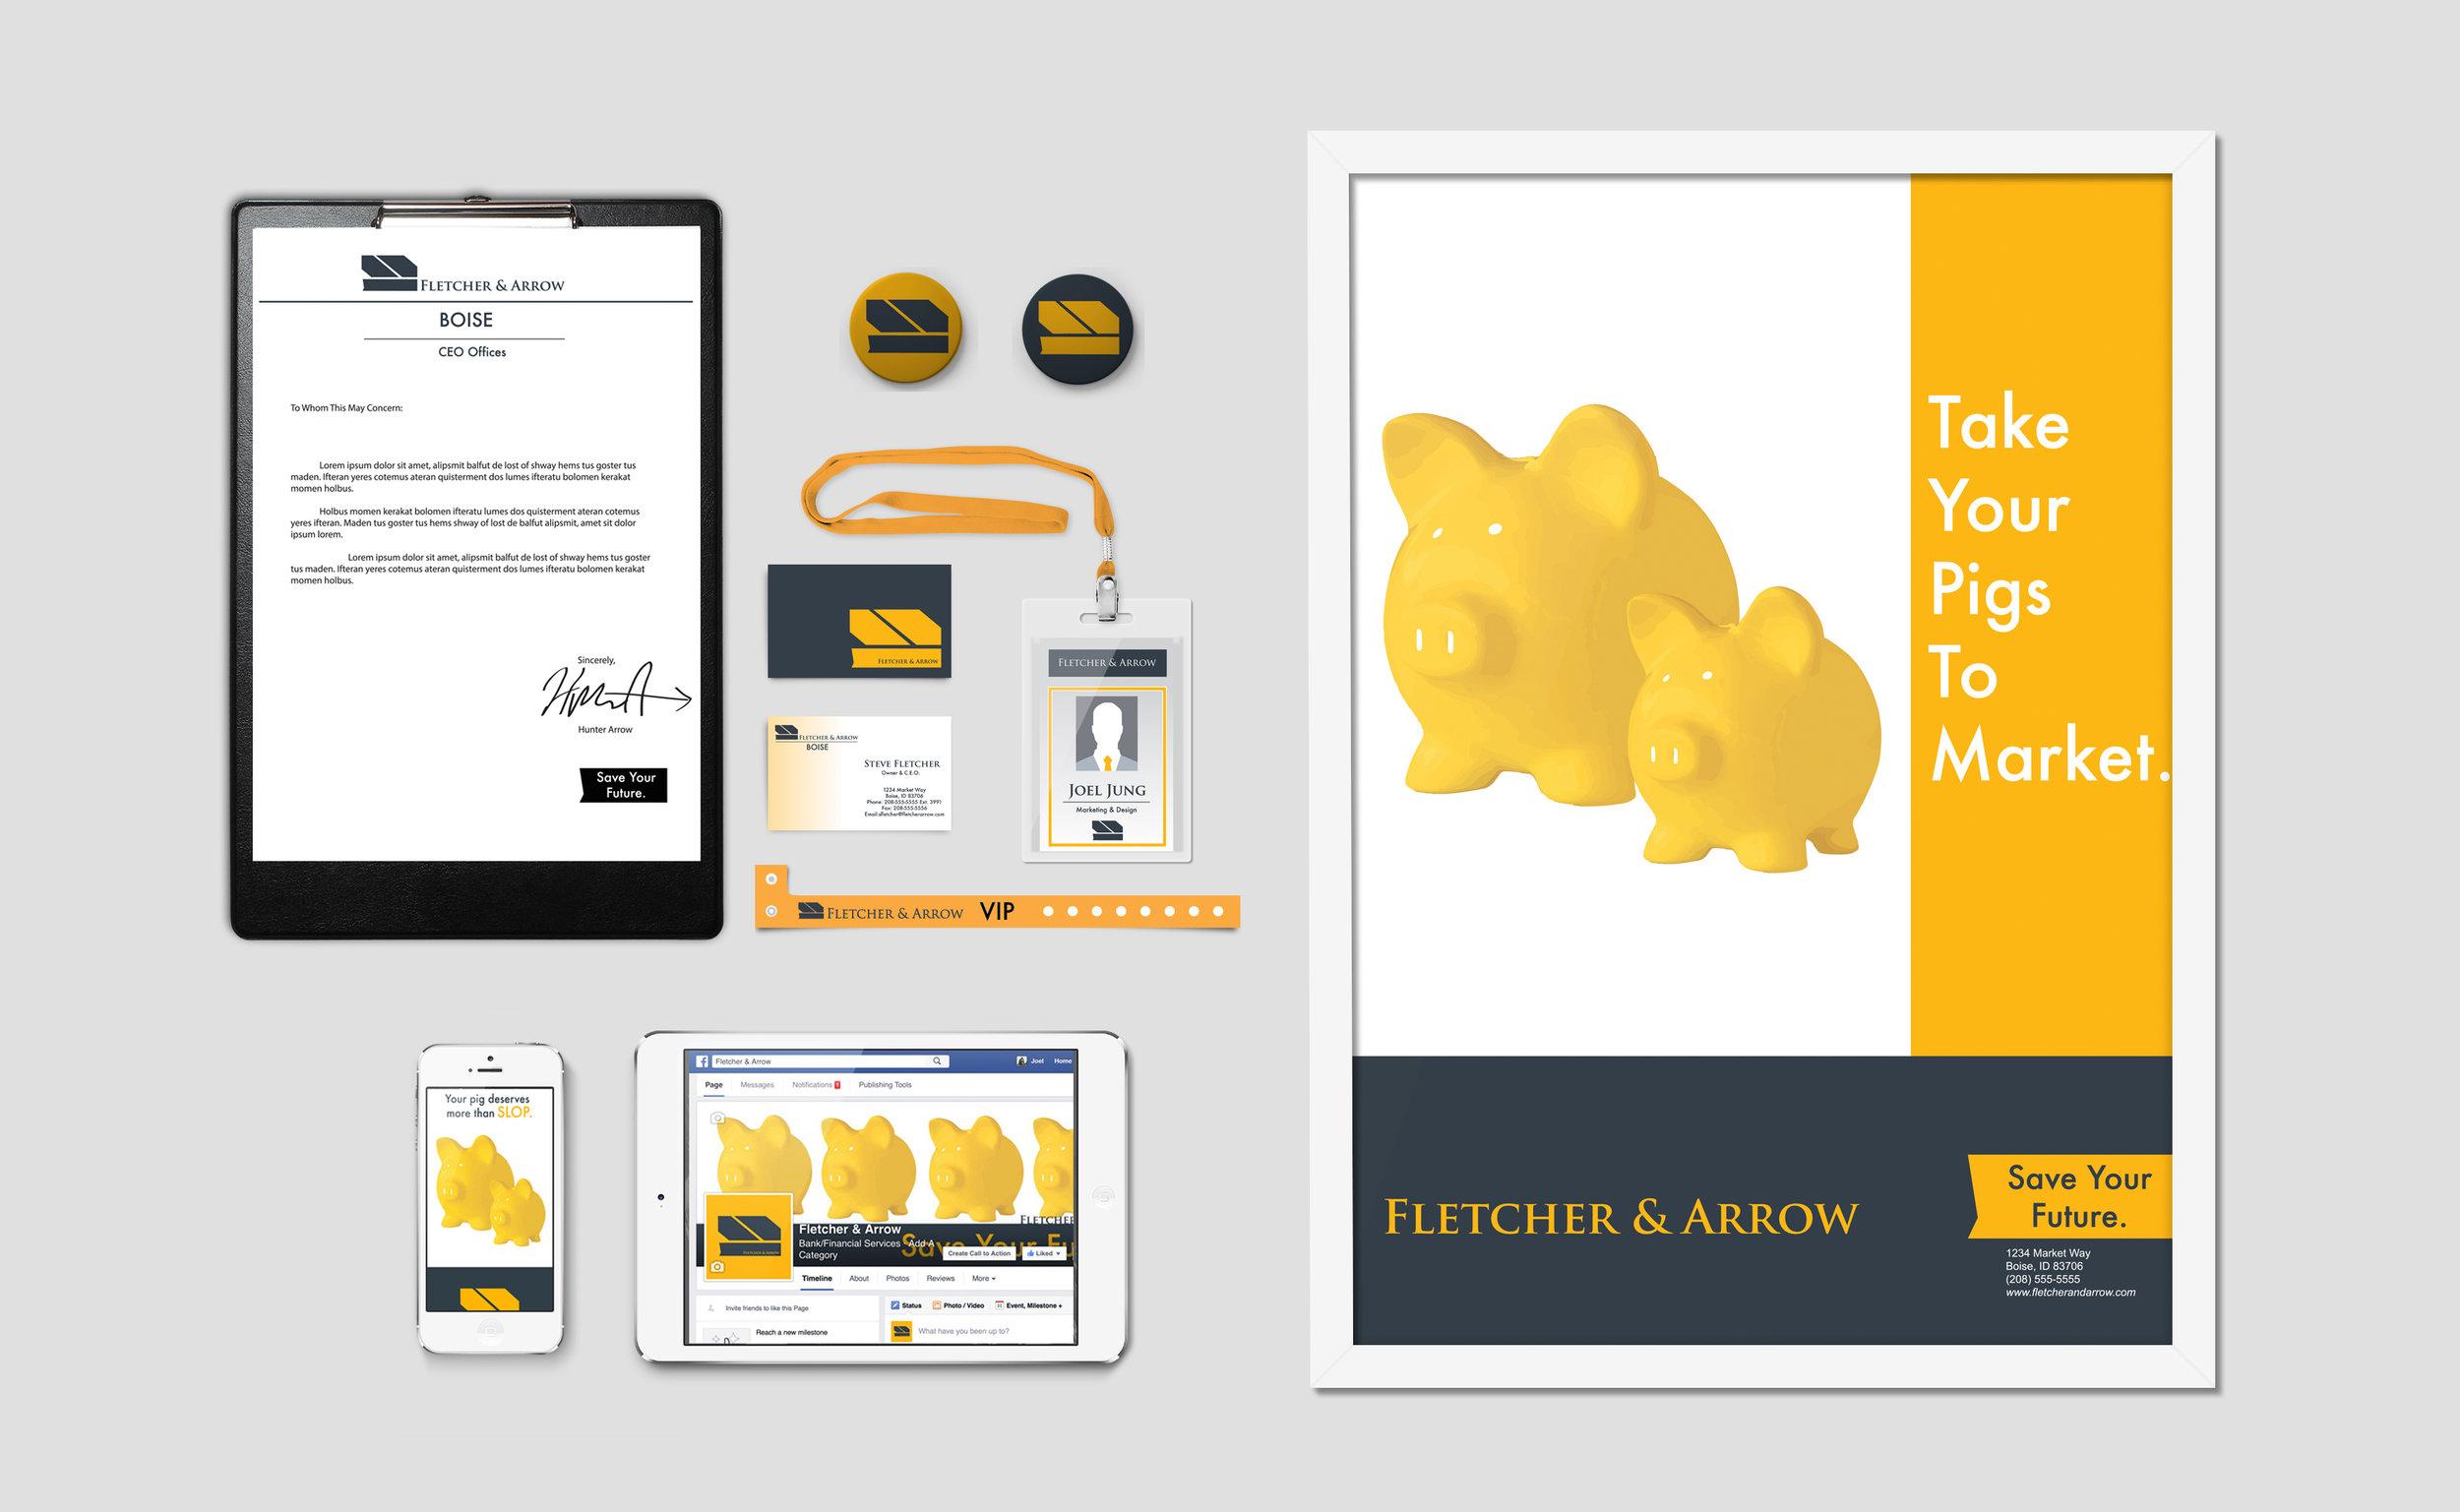 Fletcher & Arrow Marketing Examples Mockup